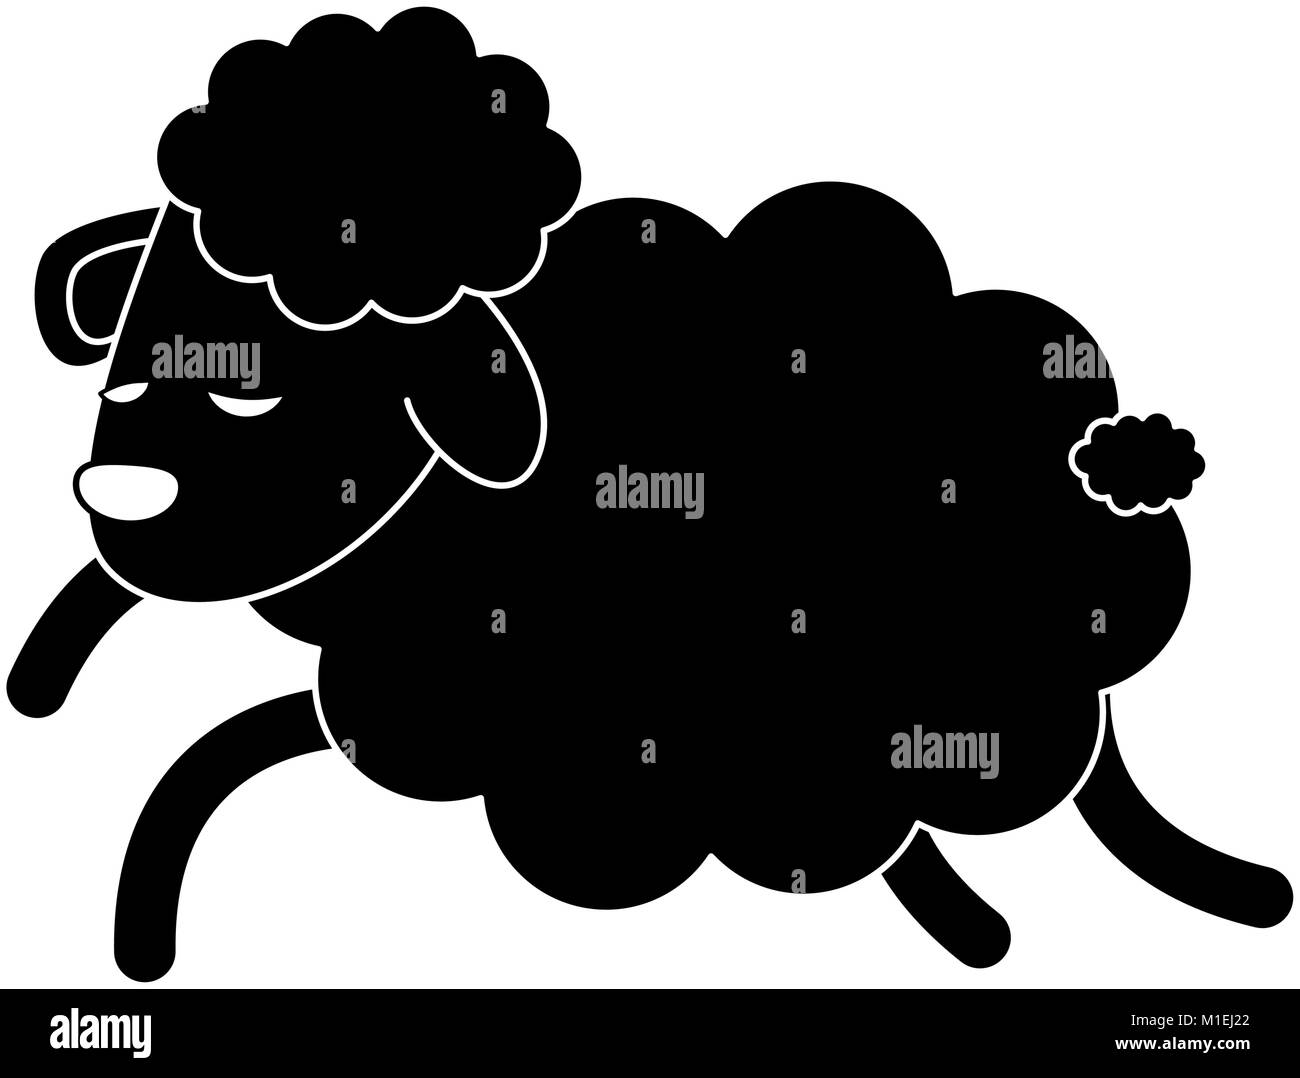 Schlafende Schafe Cartoon Stock Vektorgrafik Alamy